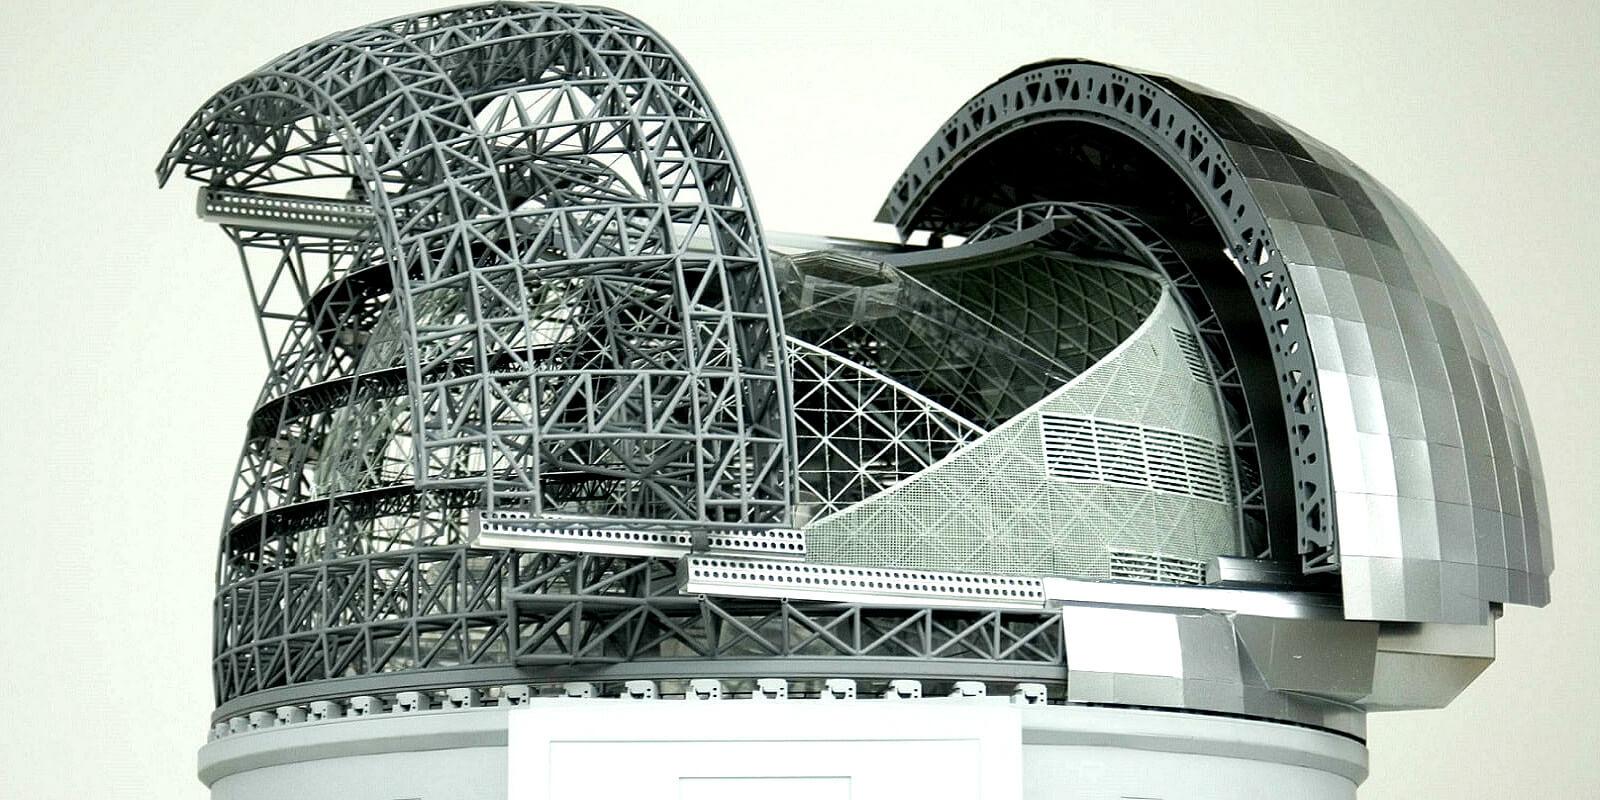 E-ELT_European_Extremely_Large_Telescope_Dome_Astronomy_Chile_IDOM_ADA_7_